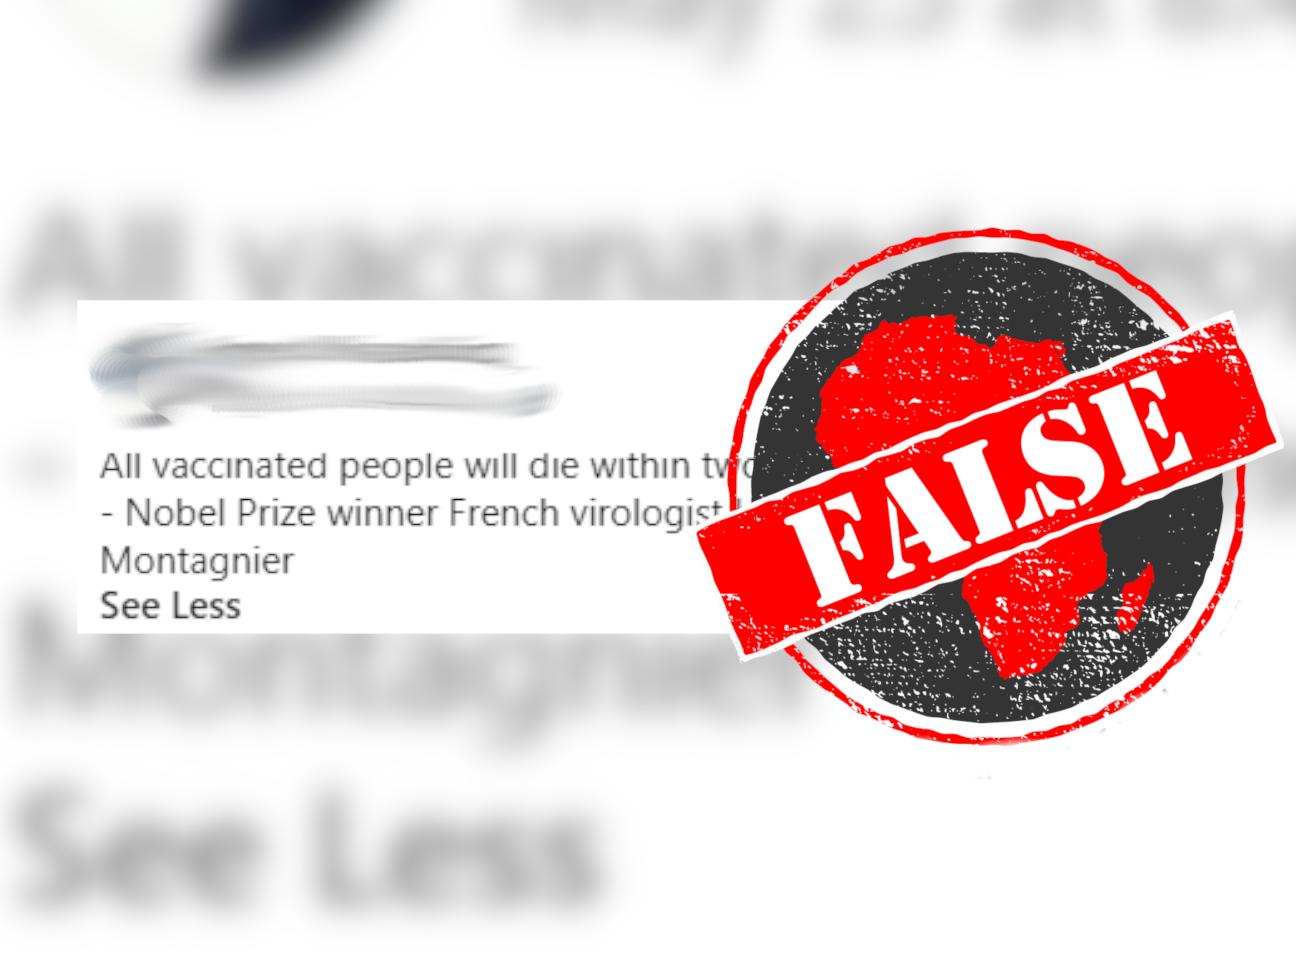 Vaccine_false